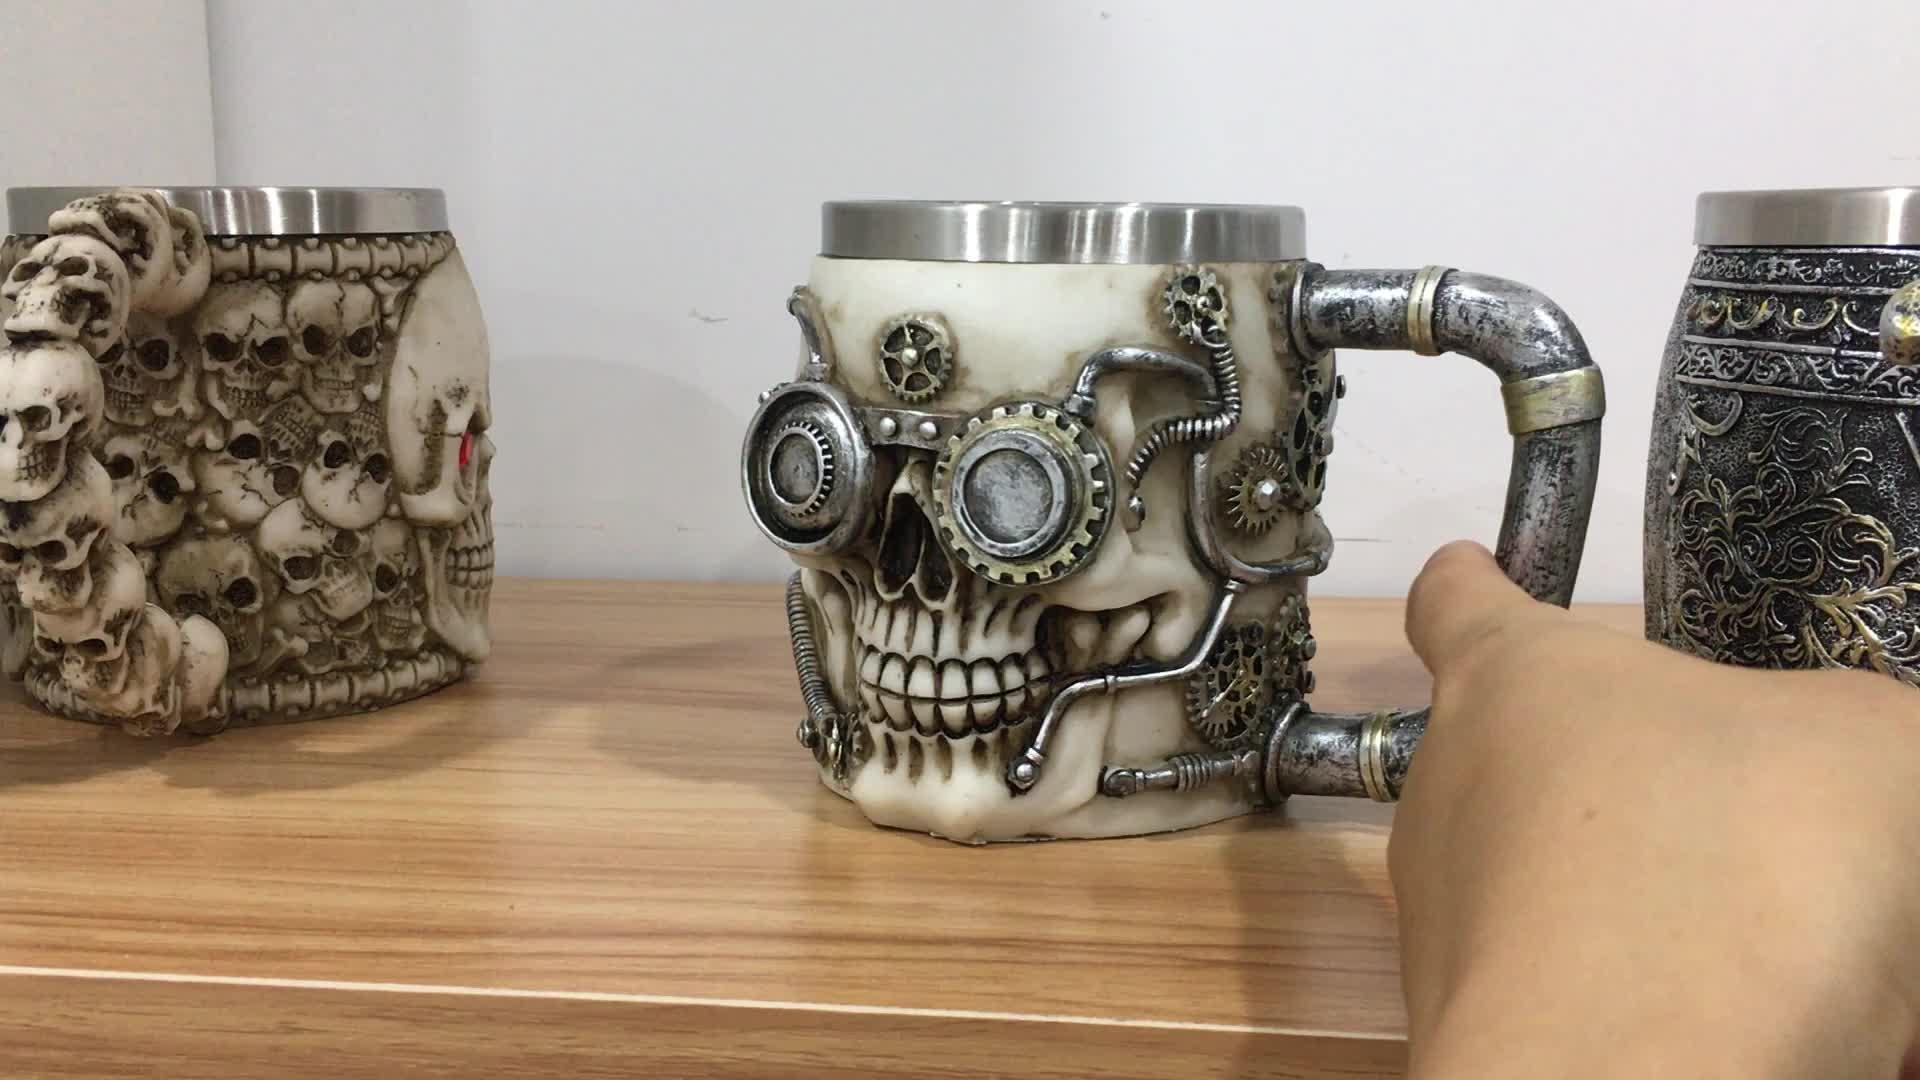 The Newest Resin 3D Skeleton Cup Mug Drinking Skull Mug for Party